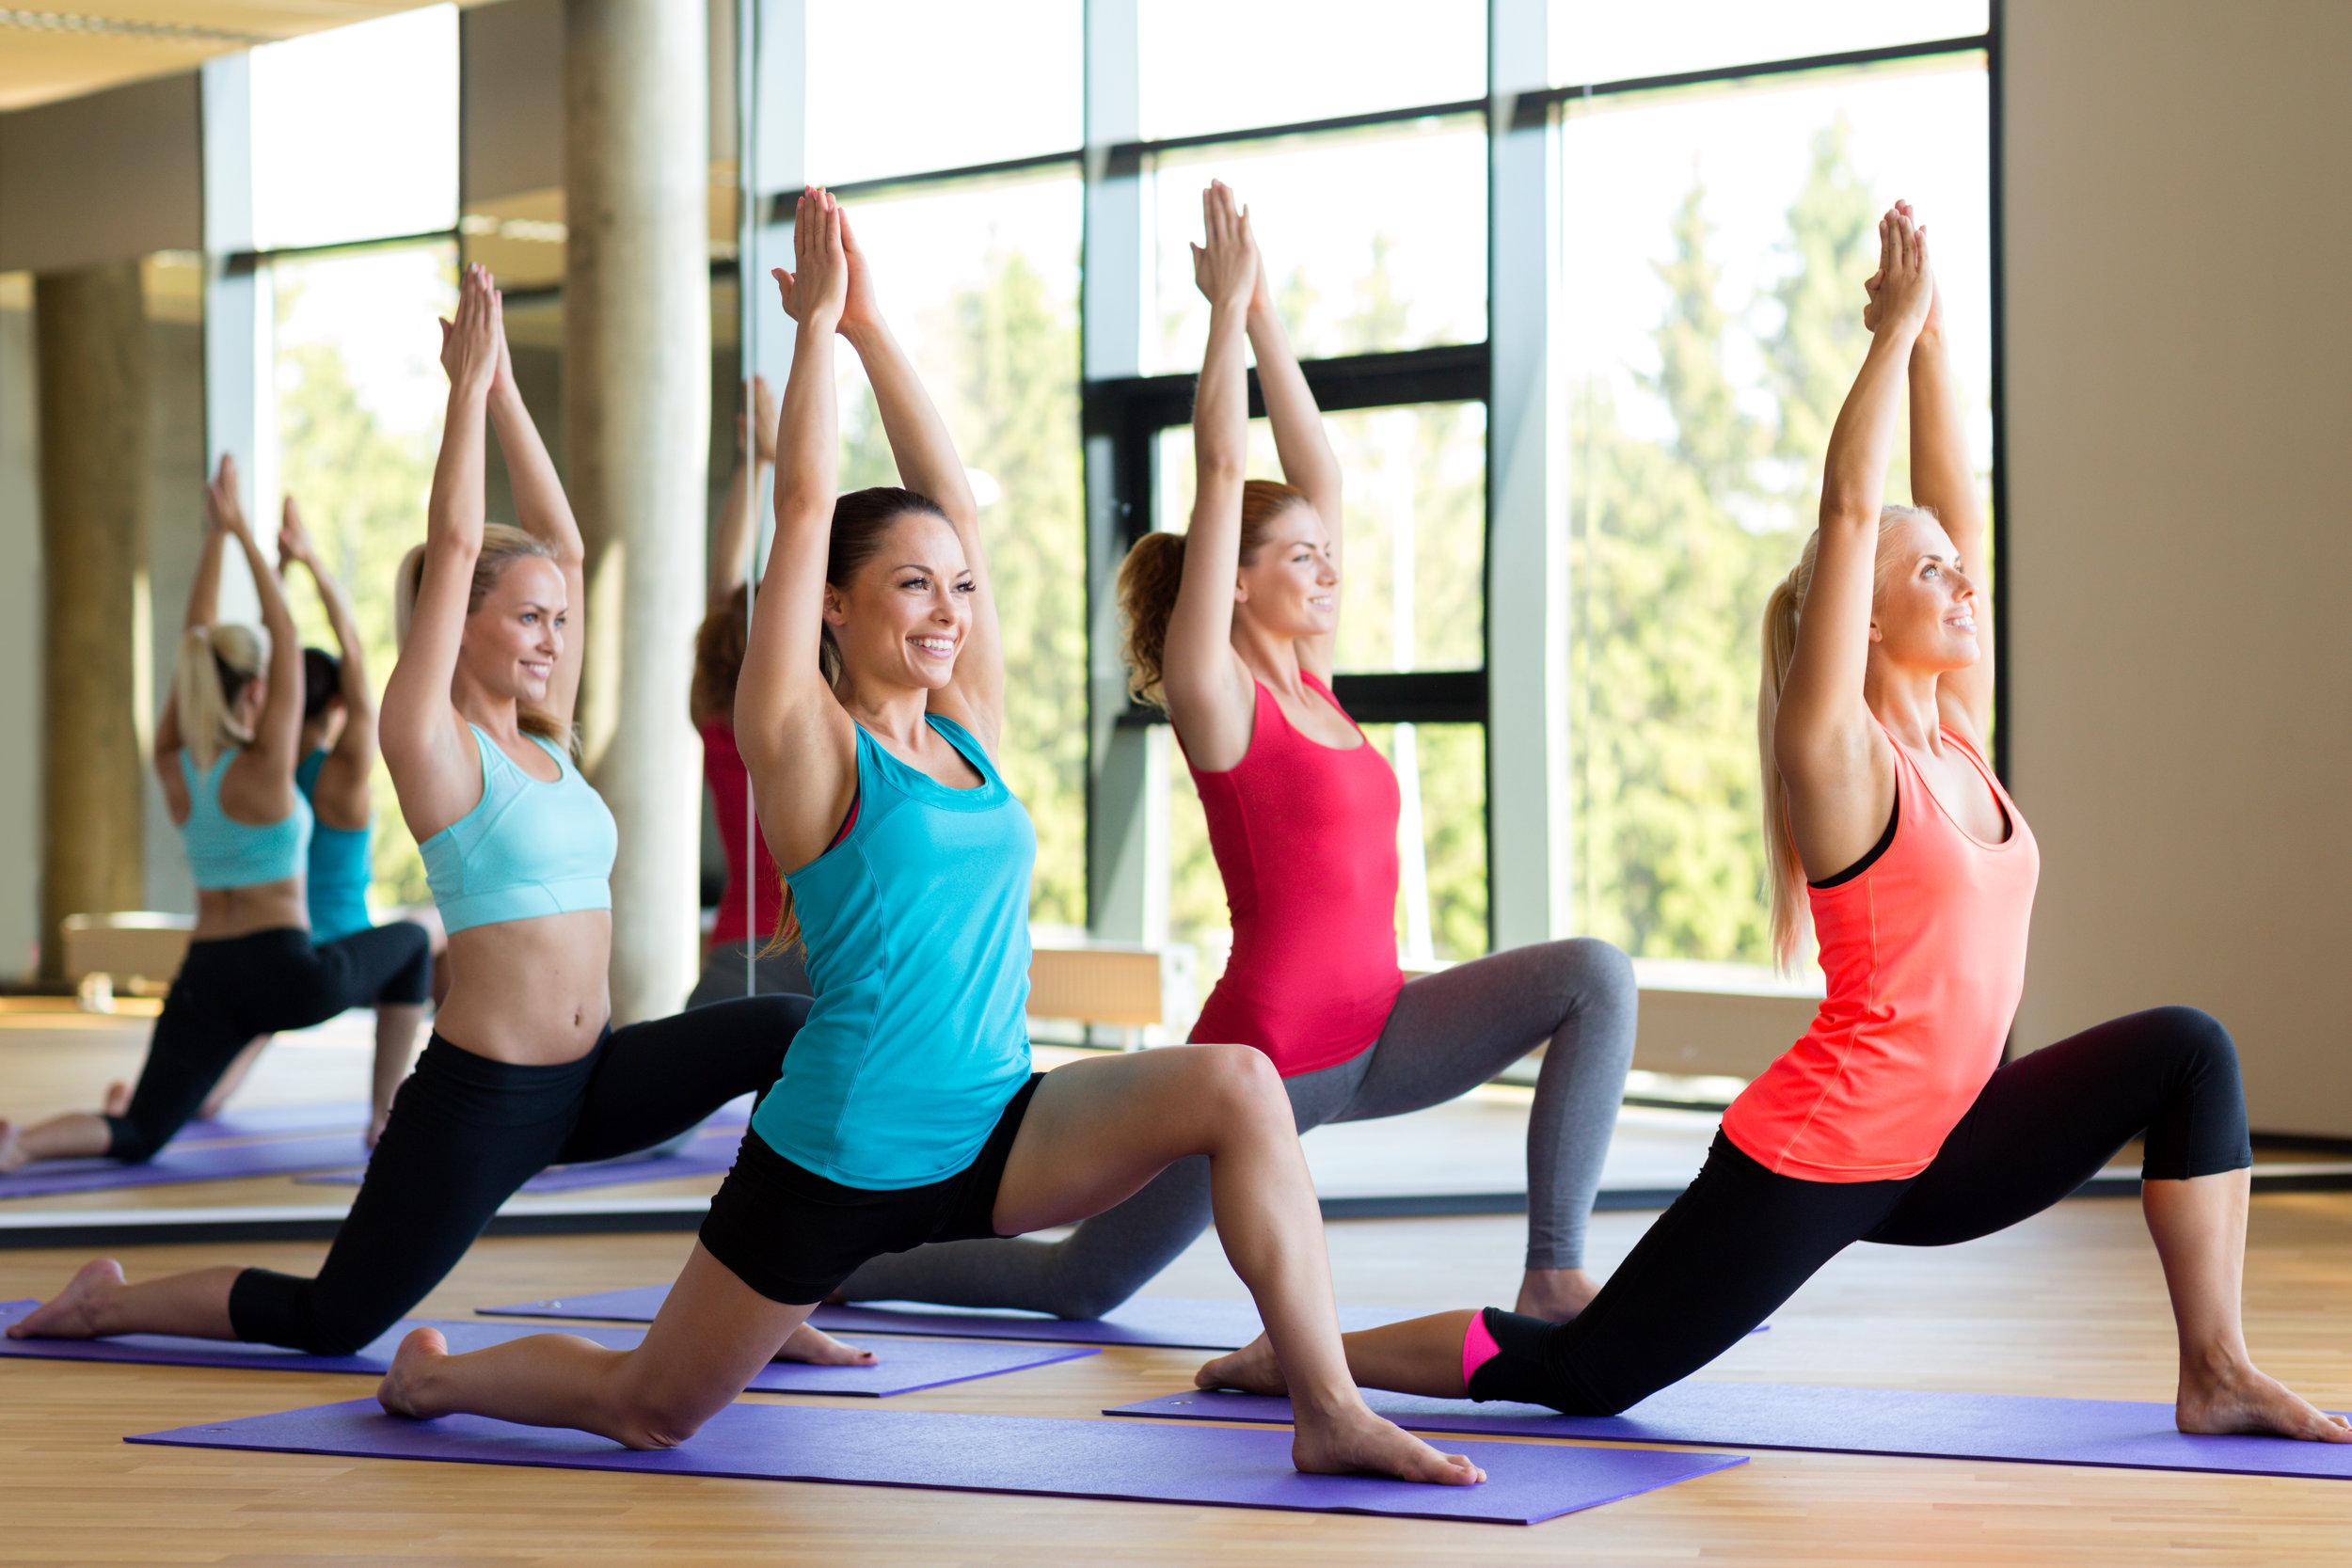 Psychotherapeutic Somatic Yoga - We offer:+ Brain Injury Yoga Classes+ Trauma Sensitive Yoga Classes+ Psychotherapeutic Yoga